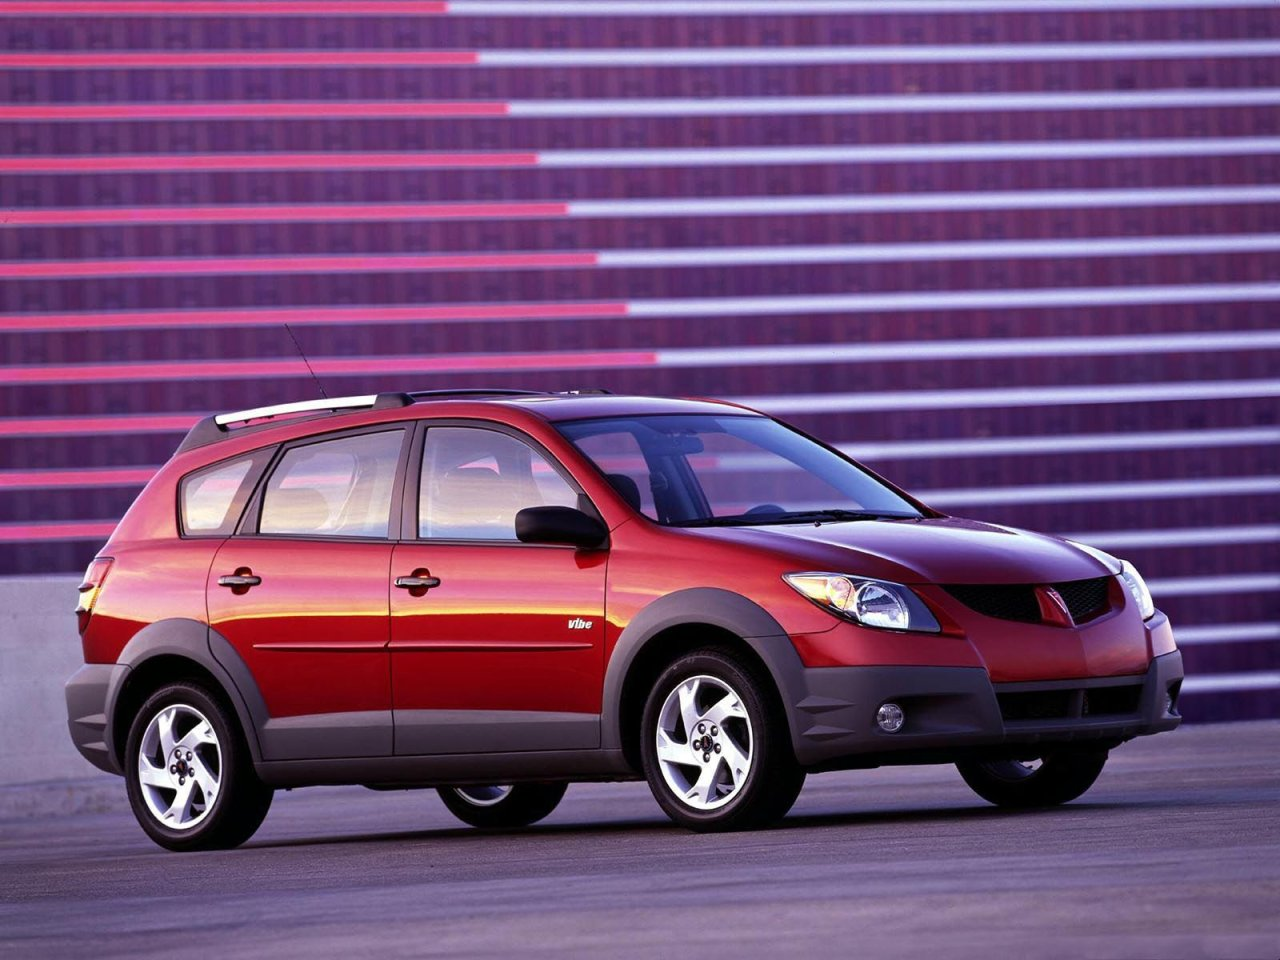 Pontiac 2002 pontiac vibe : Pontiac Vibe 2002 pontiac vibe videos car photos, Pontiac Vibe ...